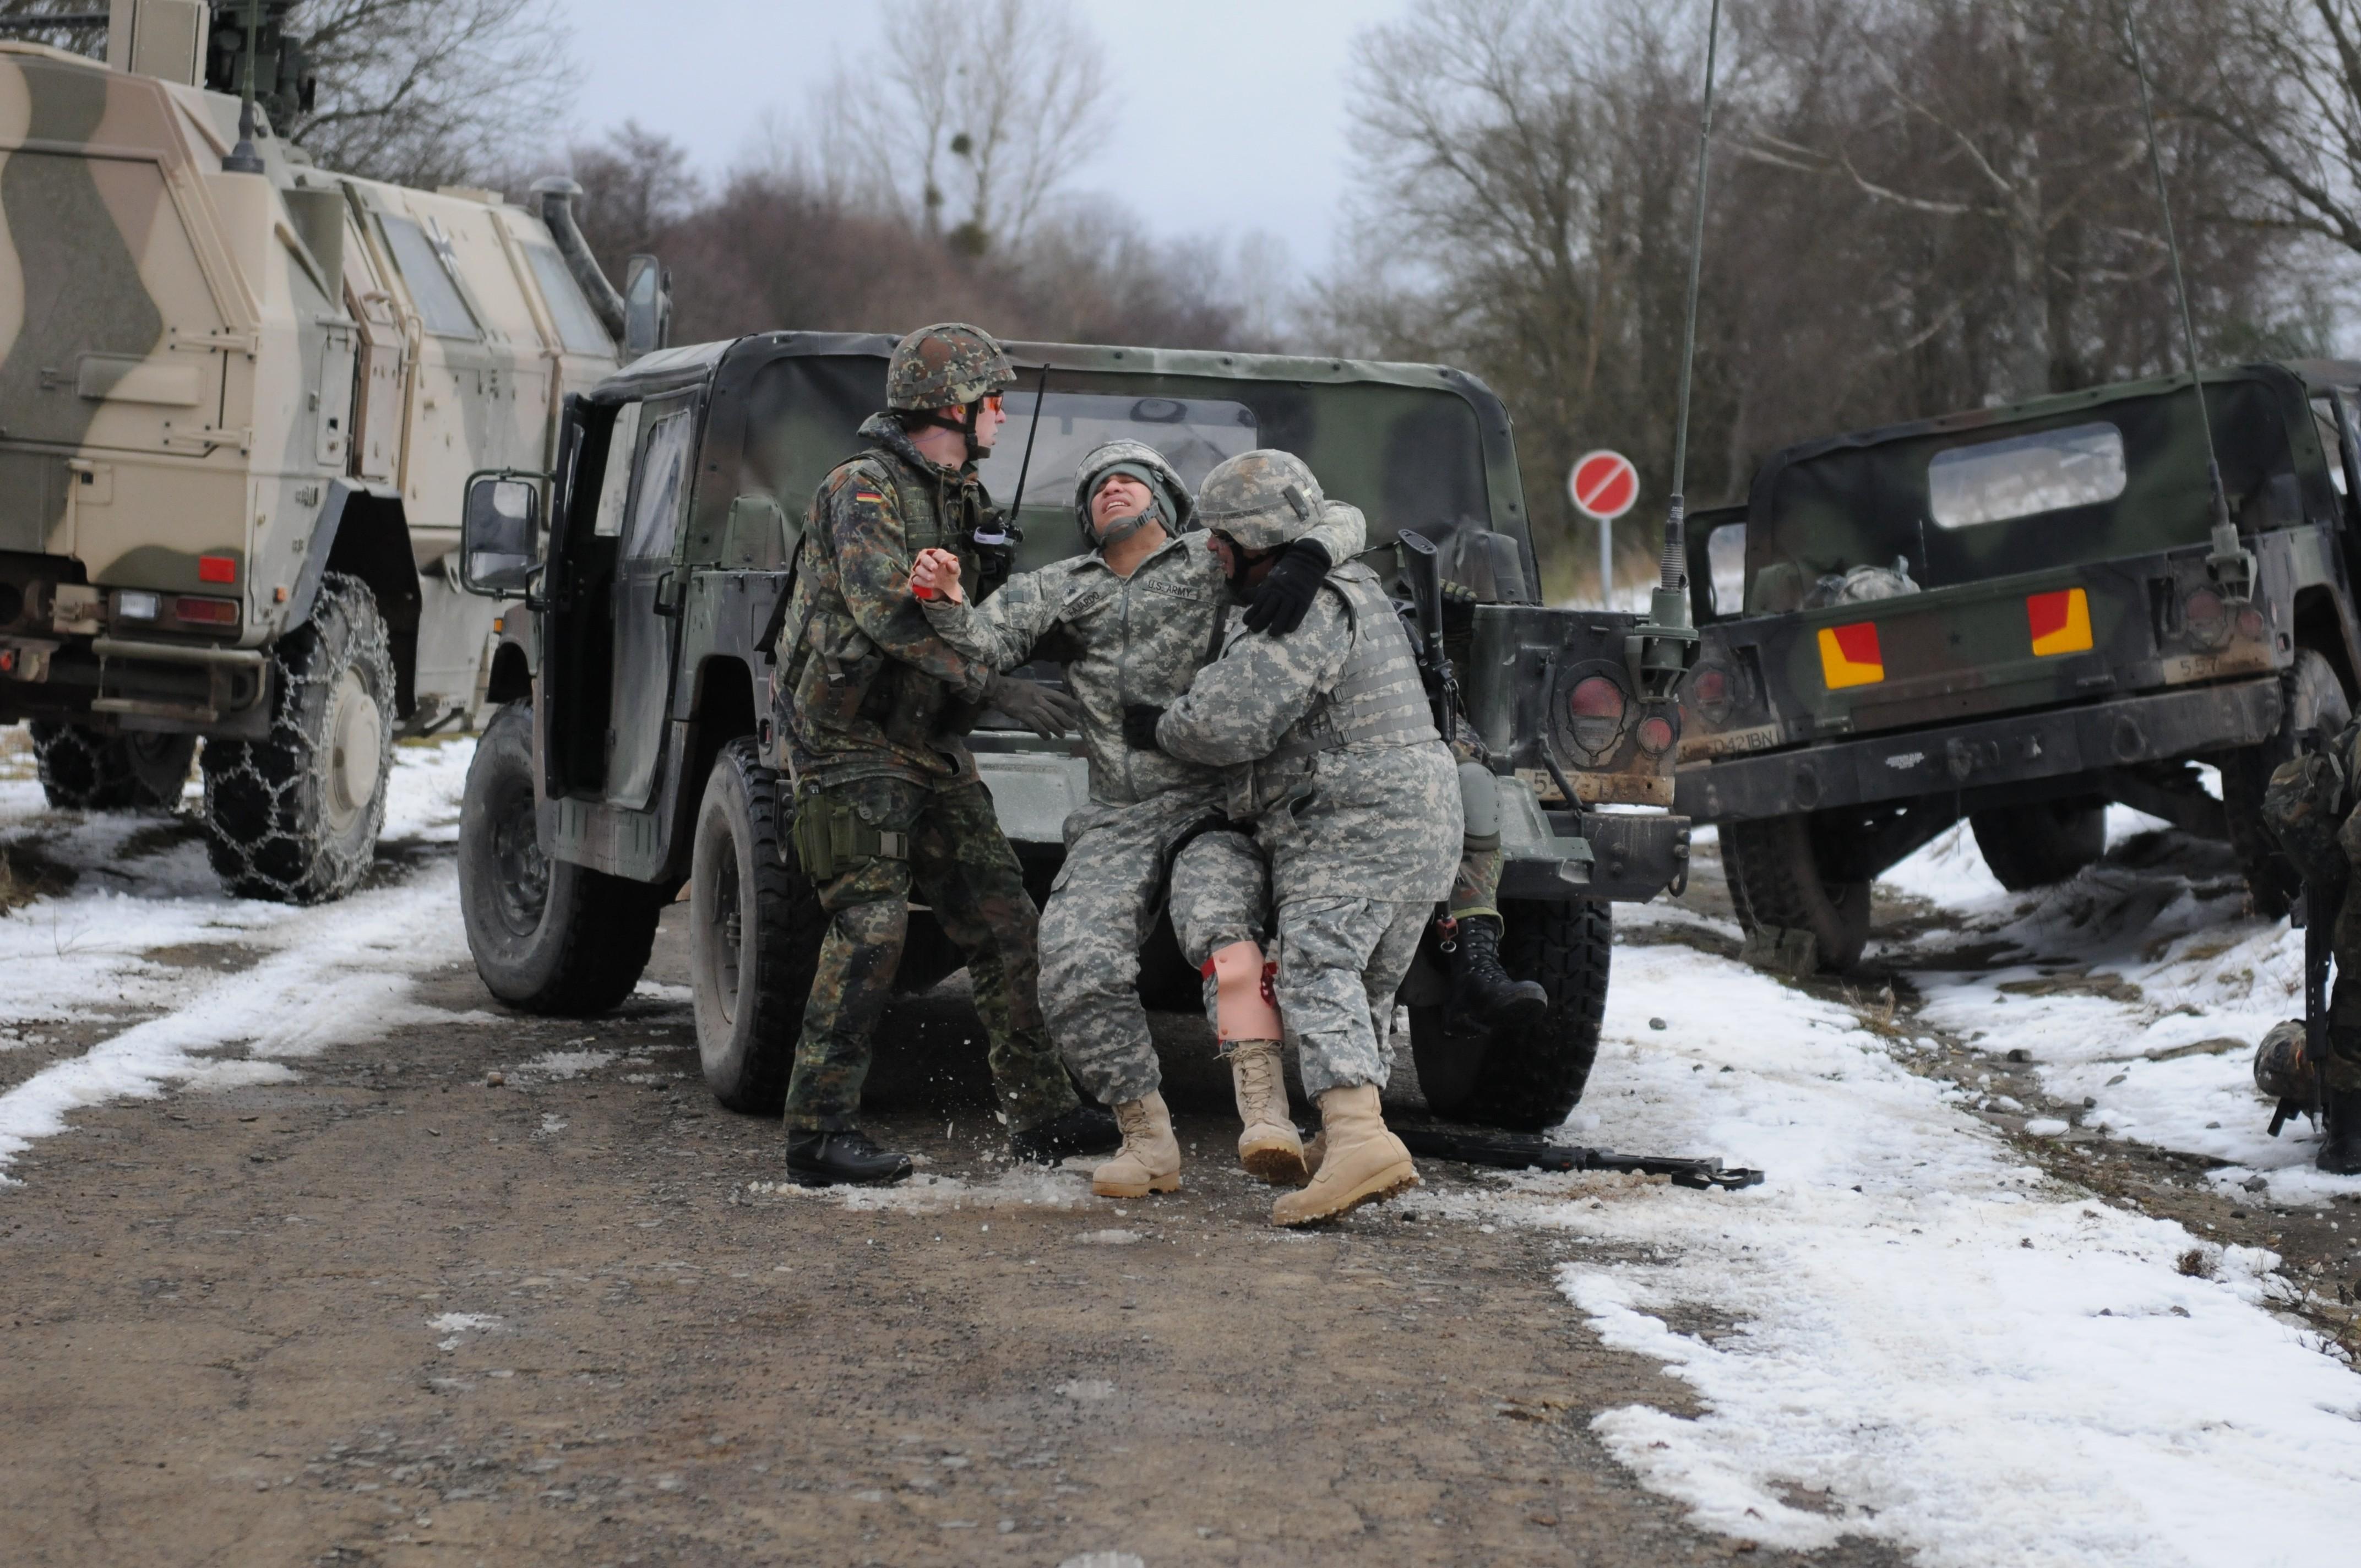 Baumholder army